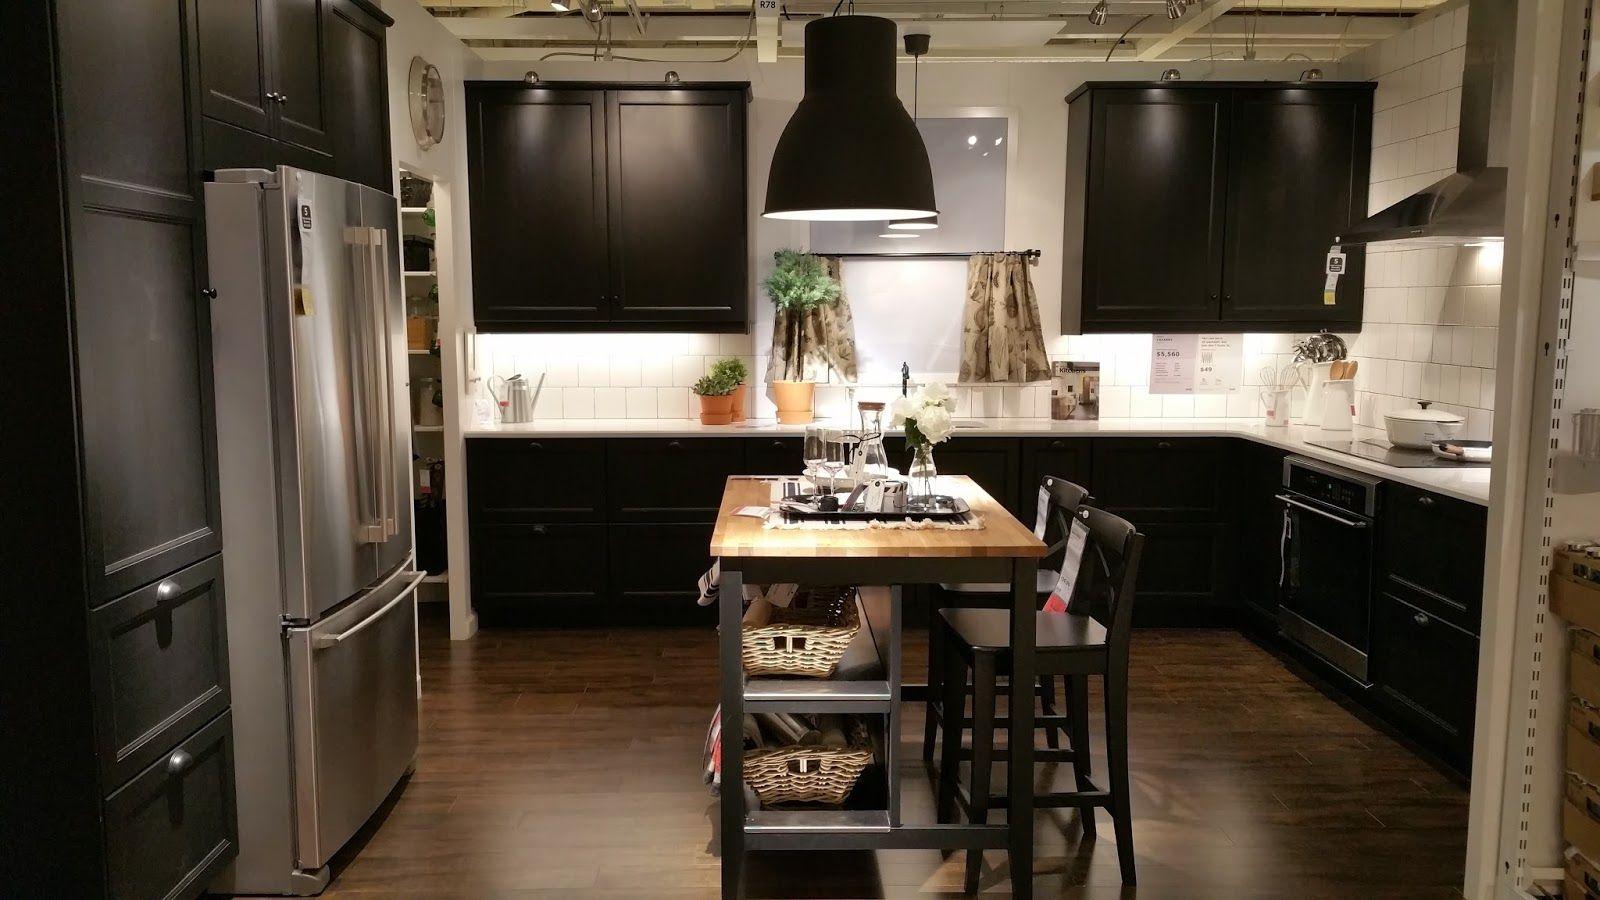 laxarby black brown design kitchens pinterest kitchens doors and ikea kitchen cabinets. Black Bedroom Furniture Sets. Home Design Ideas